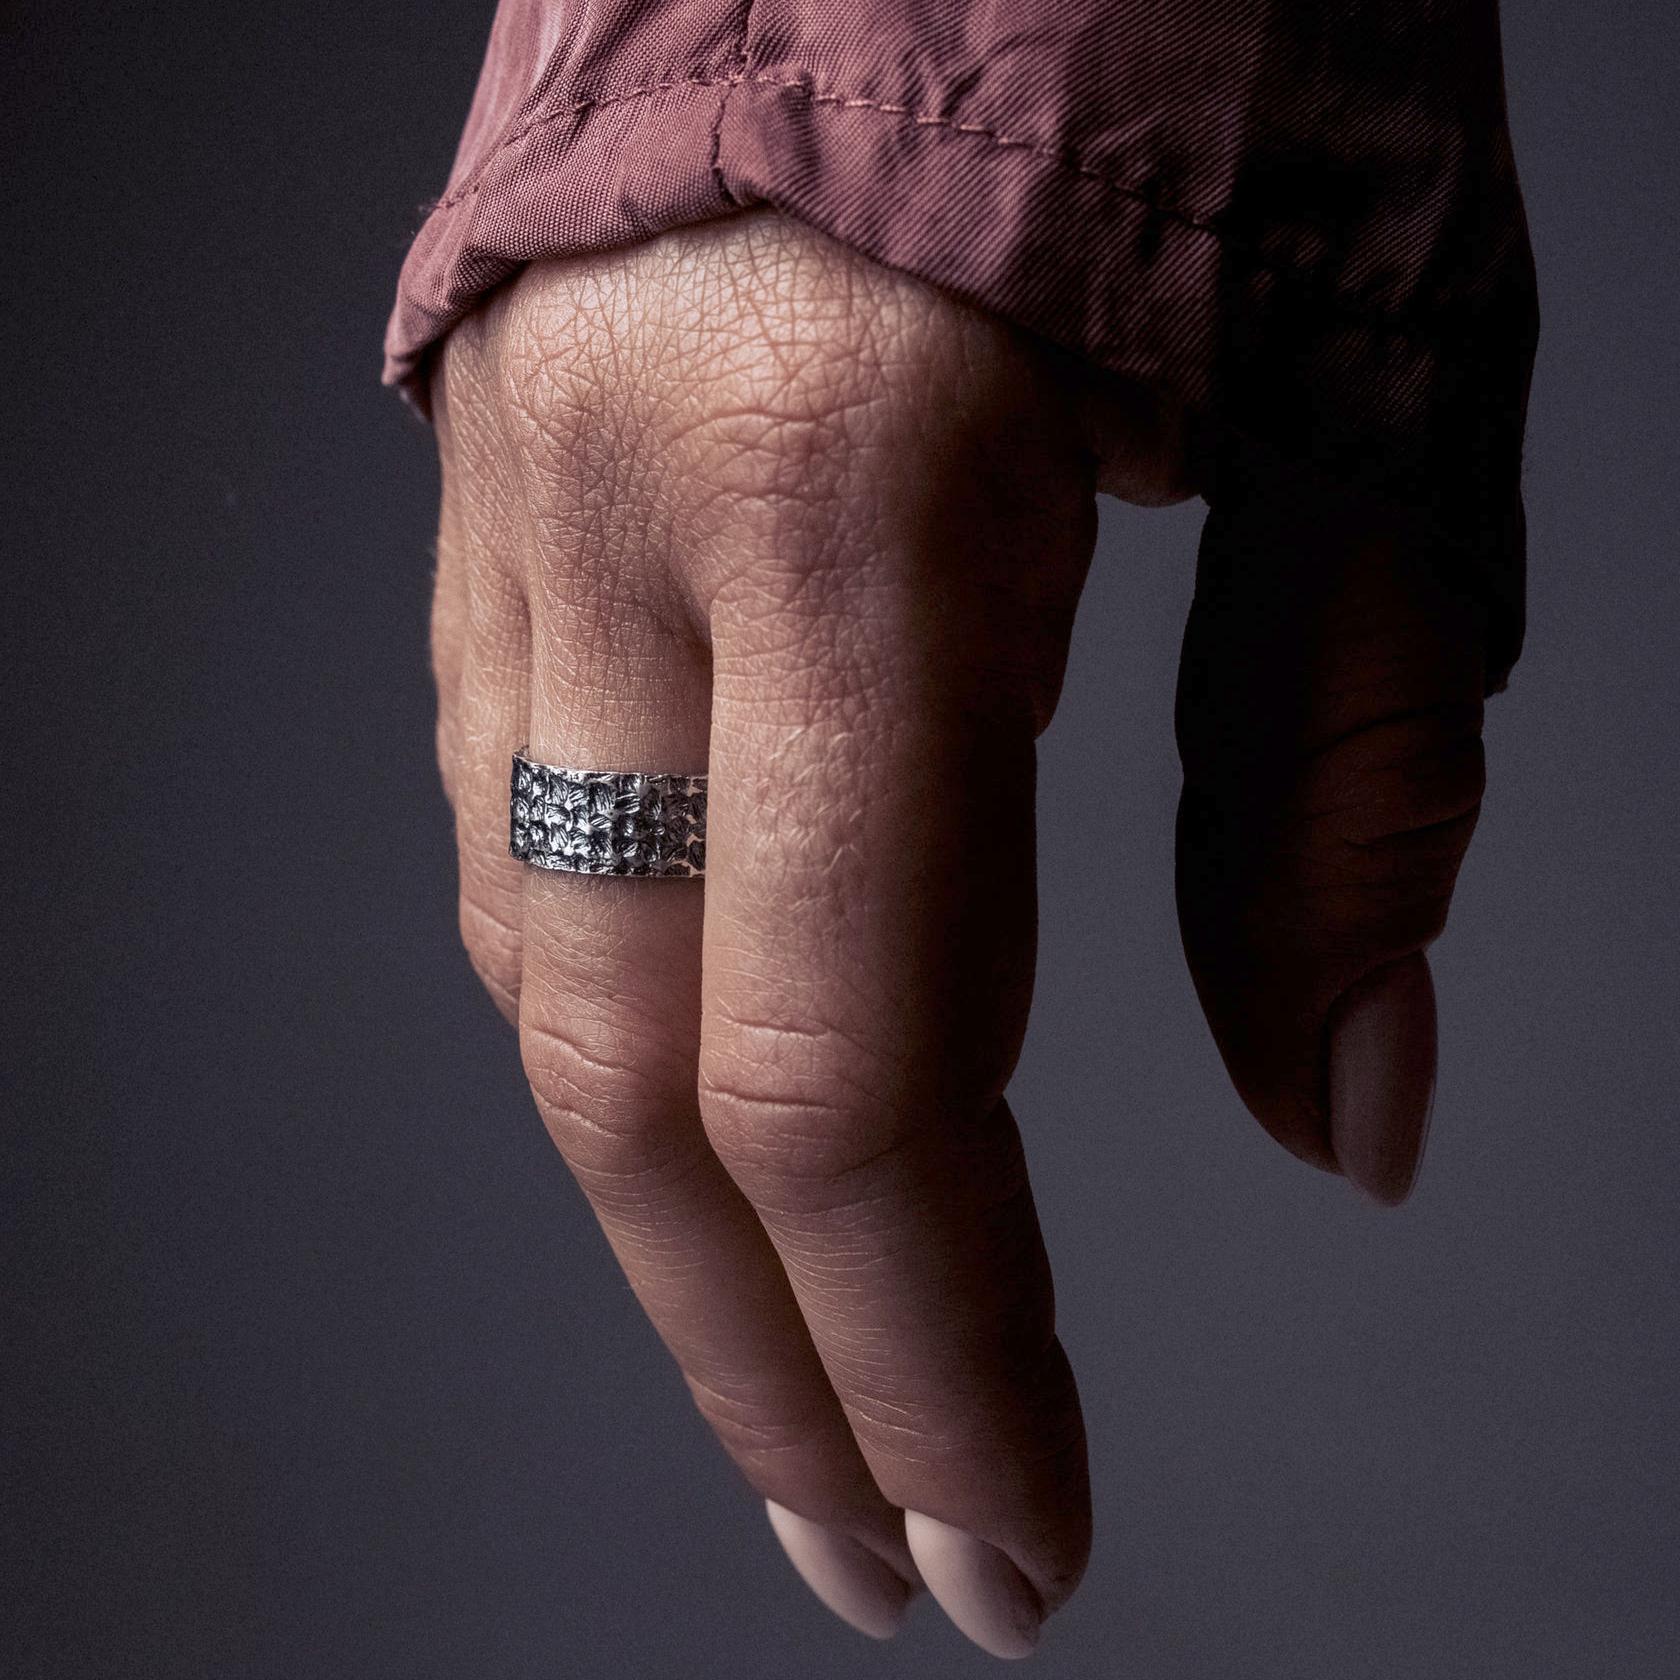 Кольцо из серебра Fibers с чернением 000091407 Zlato